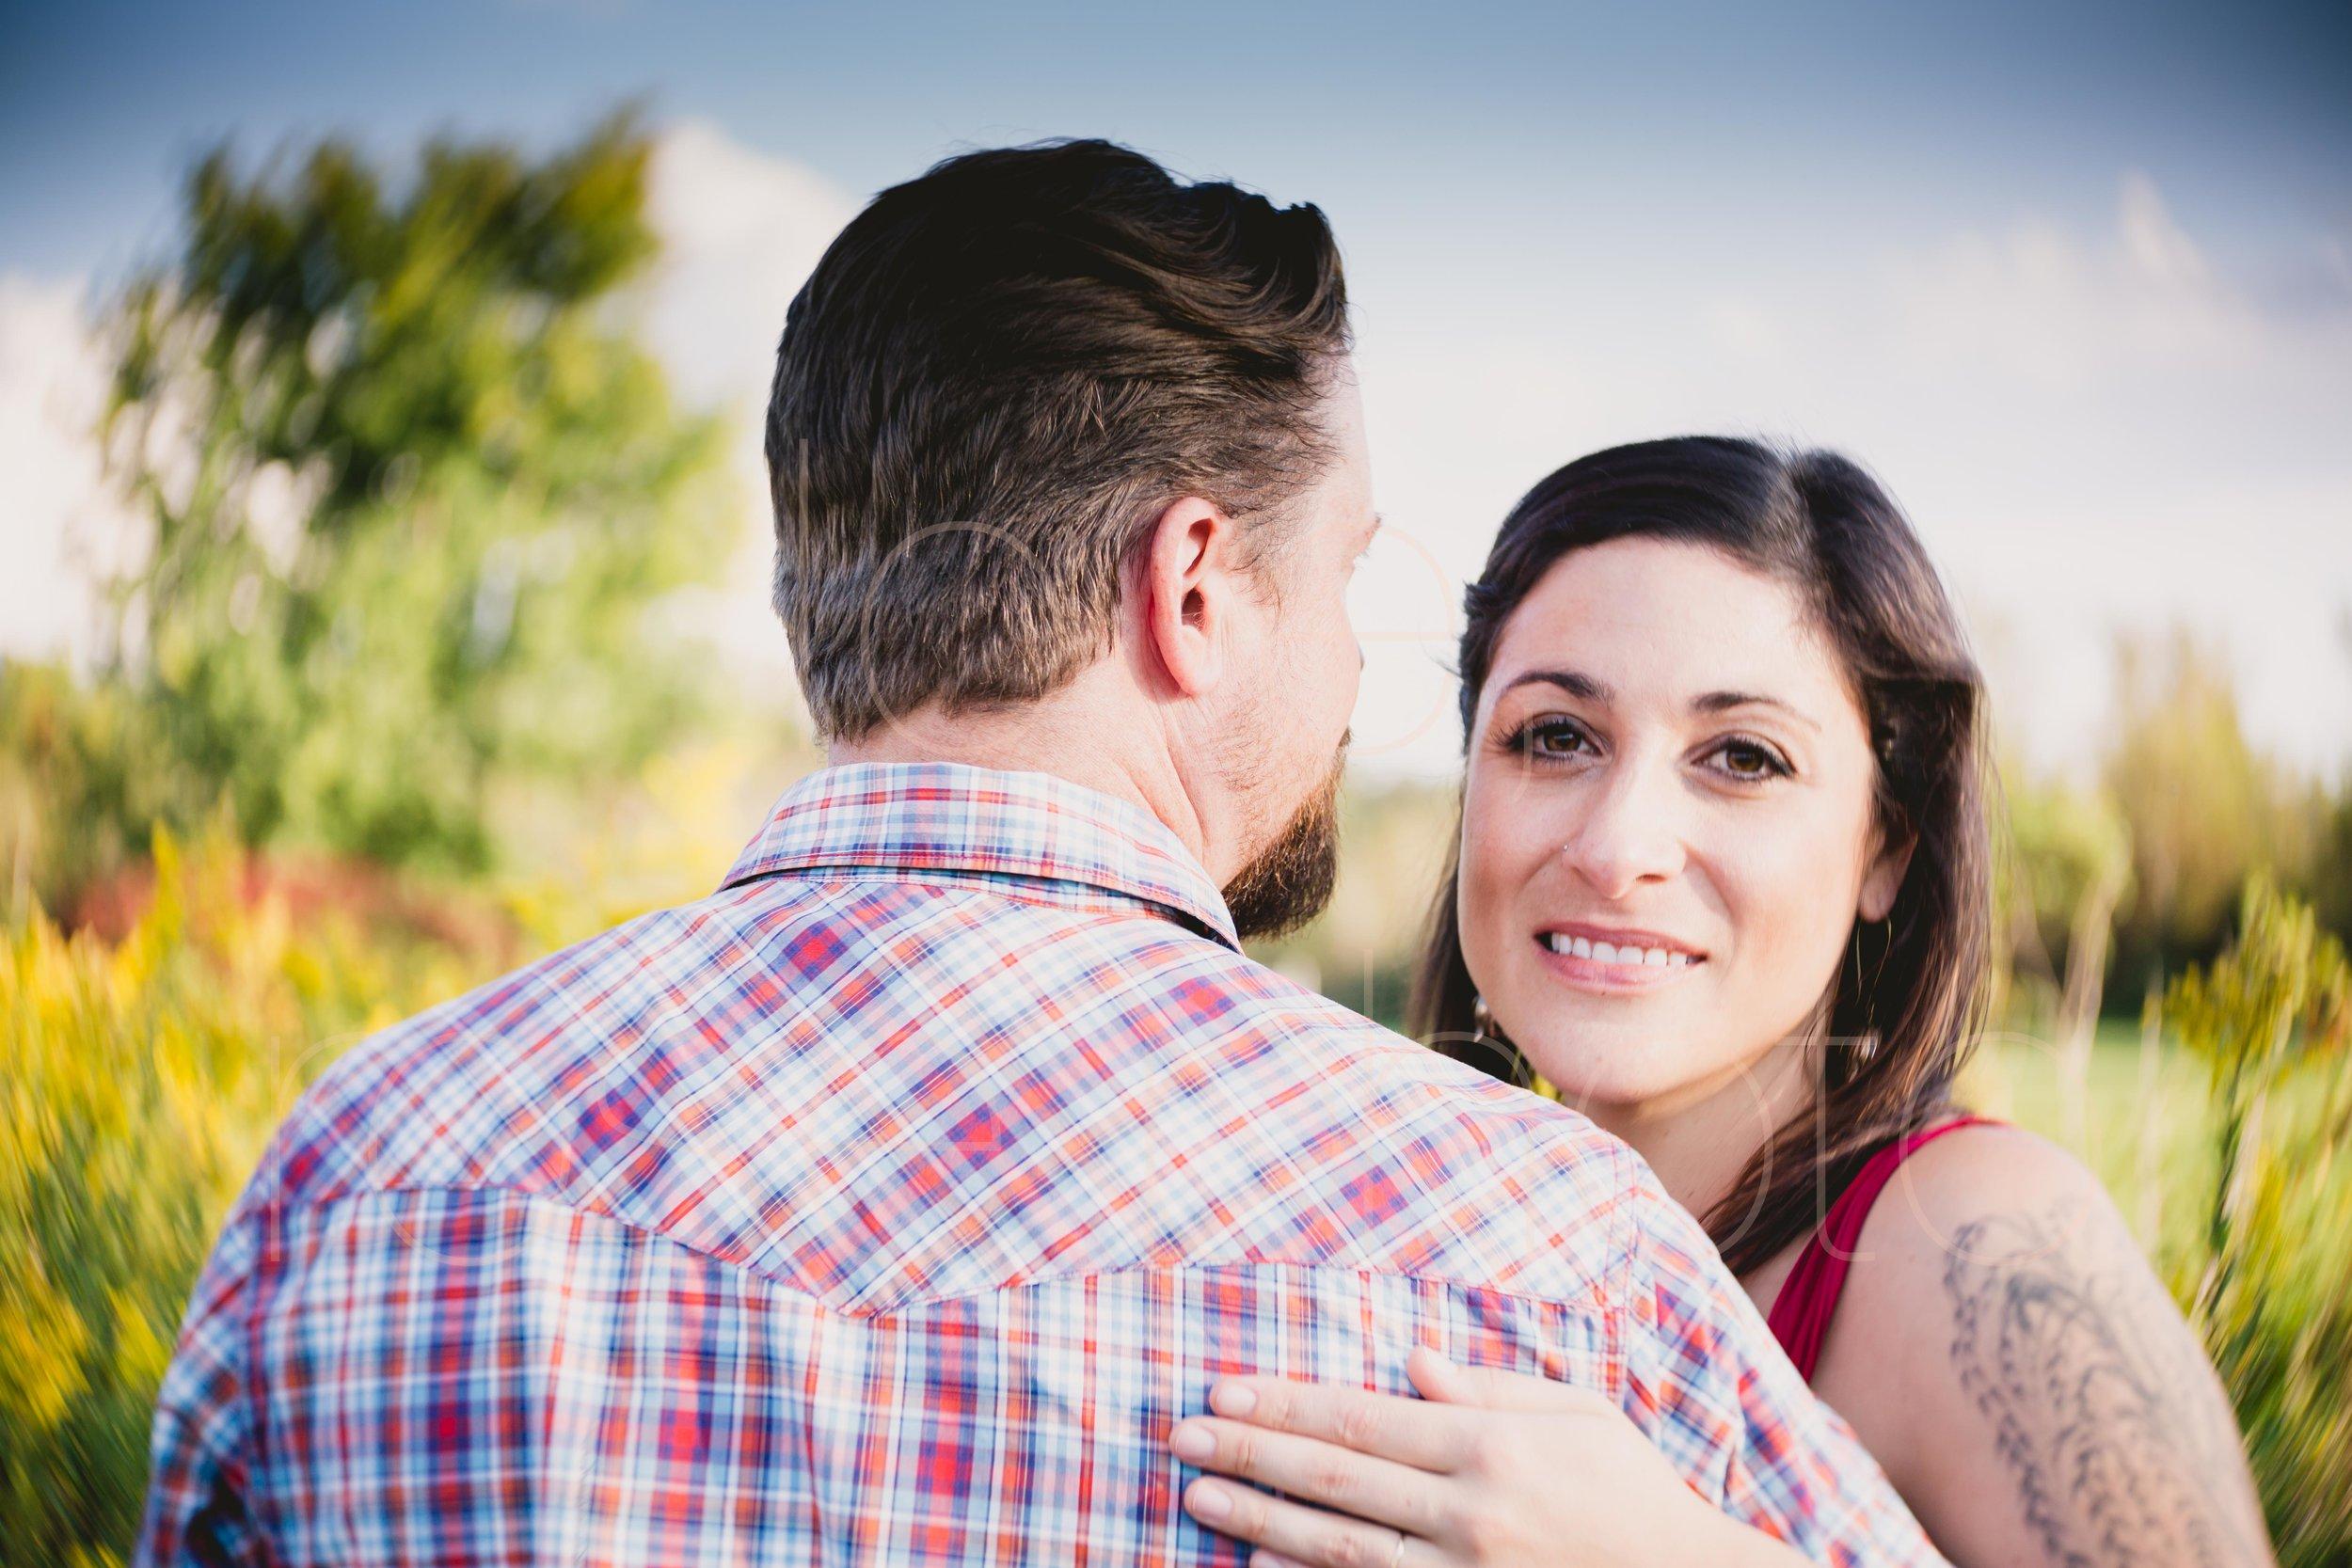 Jane Kramer Ashevegas Jason Sanford WNC Asheville wedding engagement shoot by Rose Photo-20.jpg